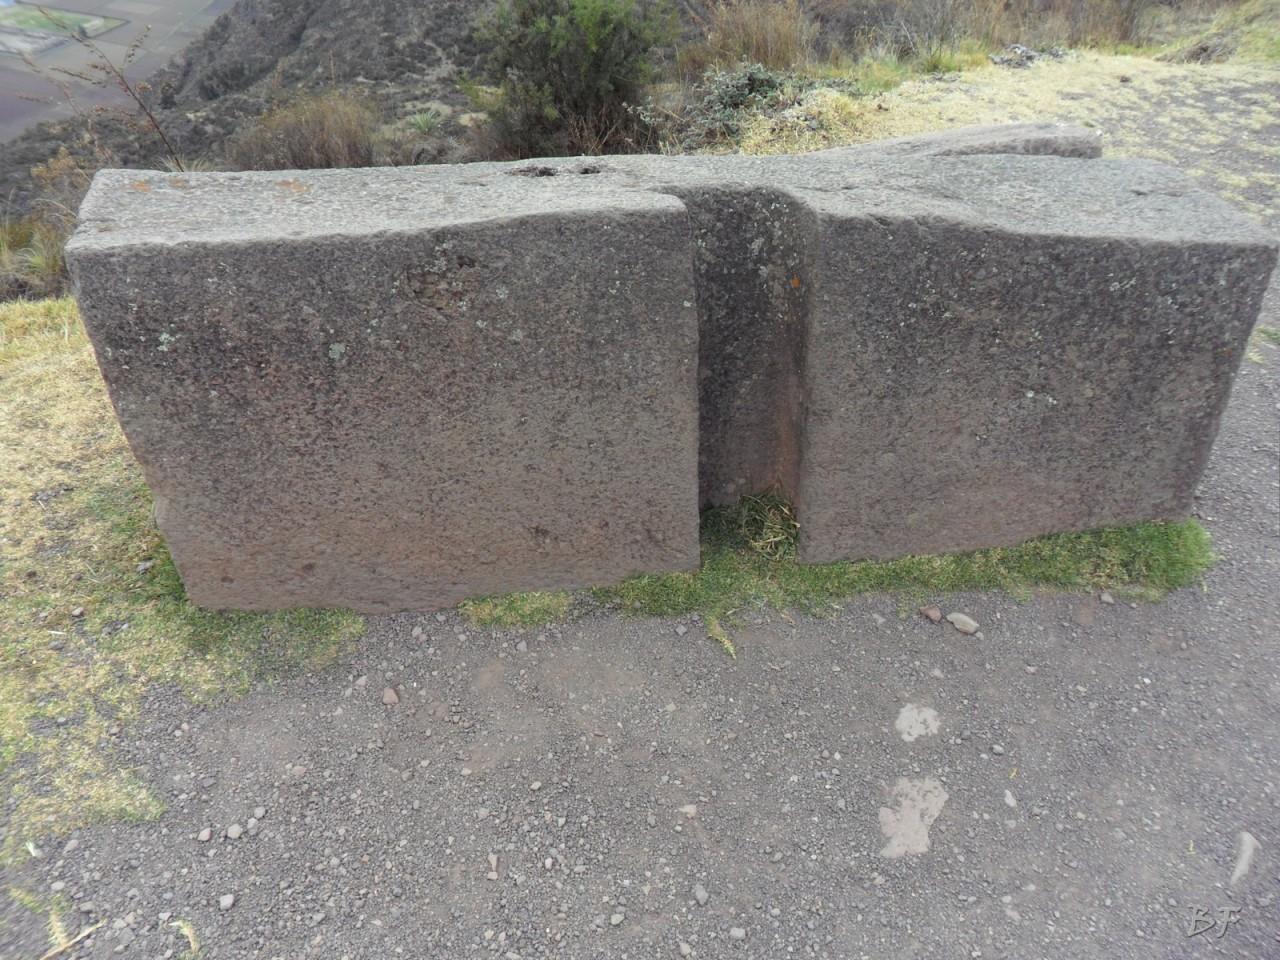 Mura-Poligonali-Megaliti-Altari-Rupestri-Pisac-Cusco-Perù-64